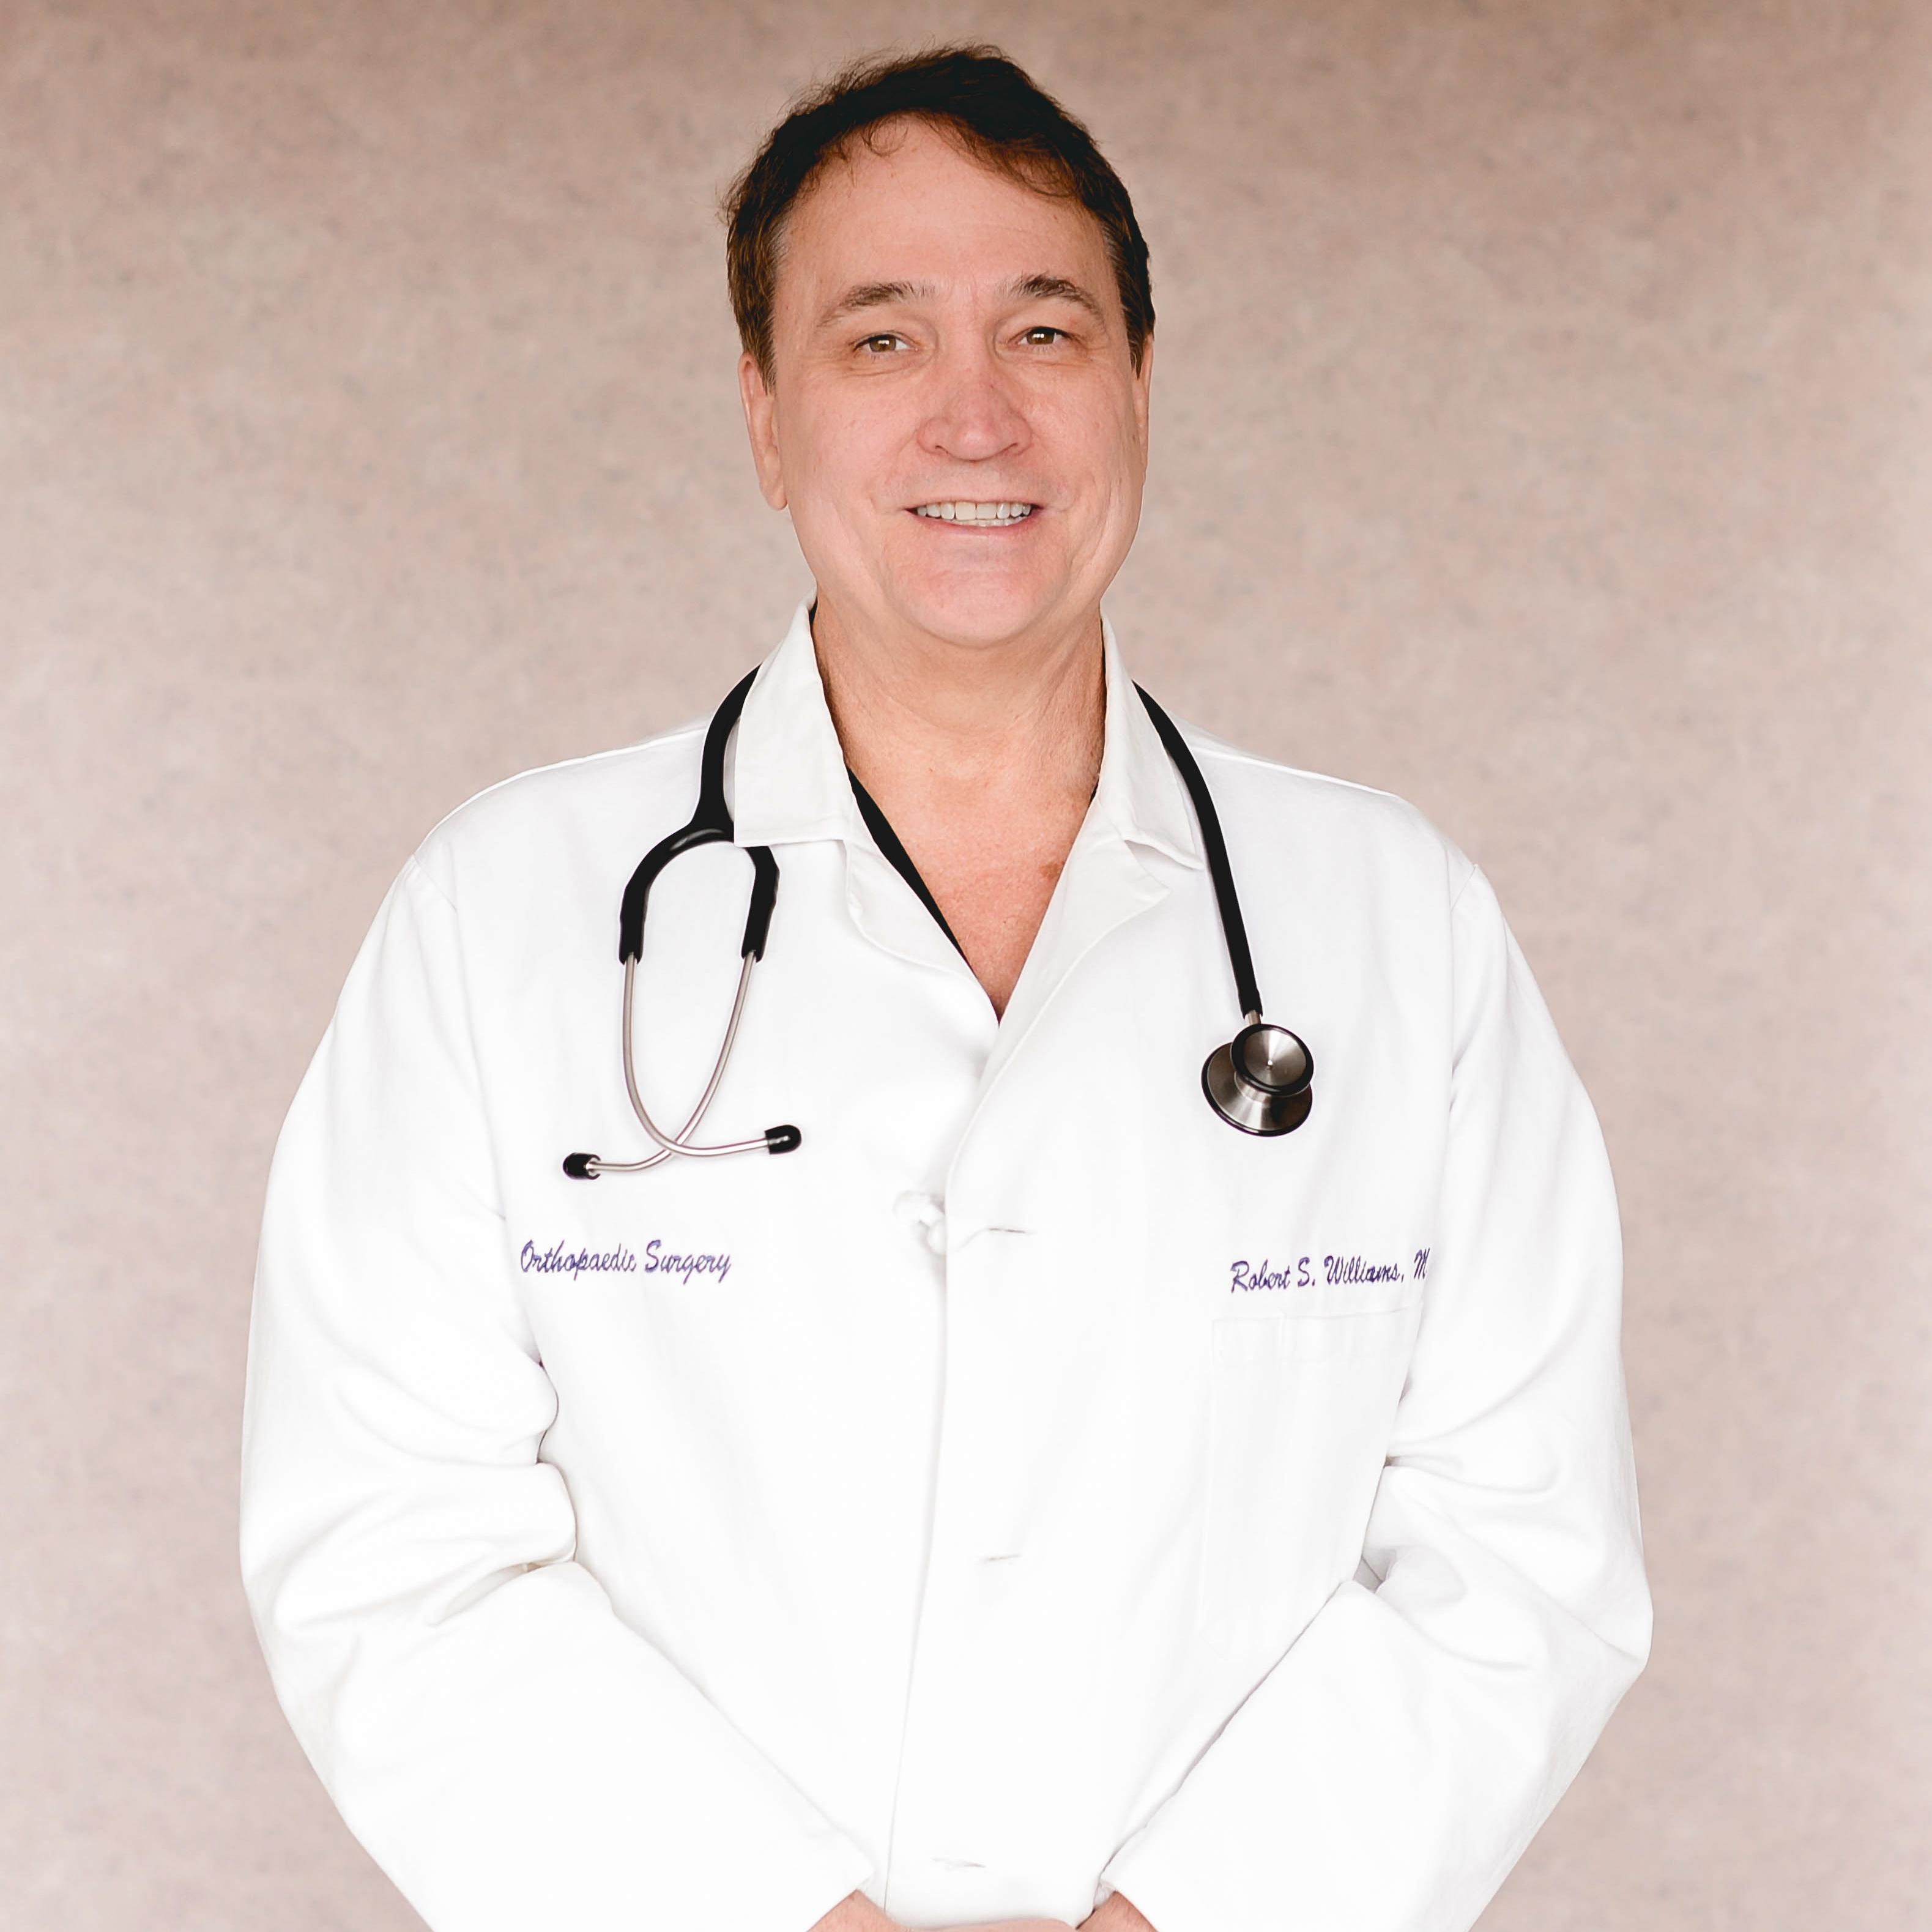 Dr. Rob Williams